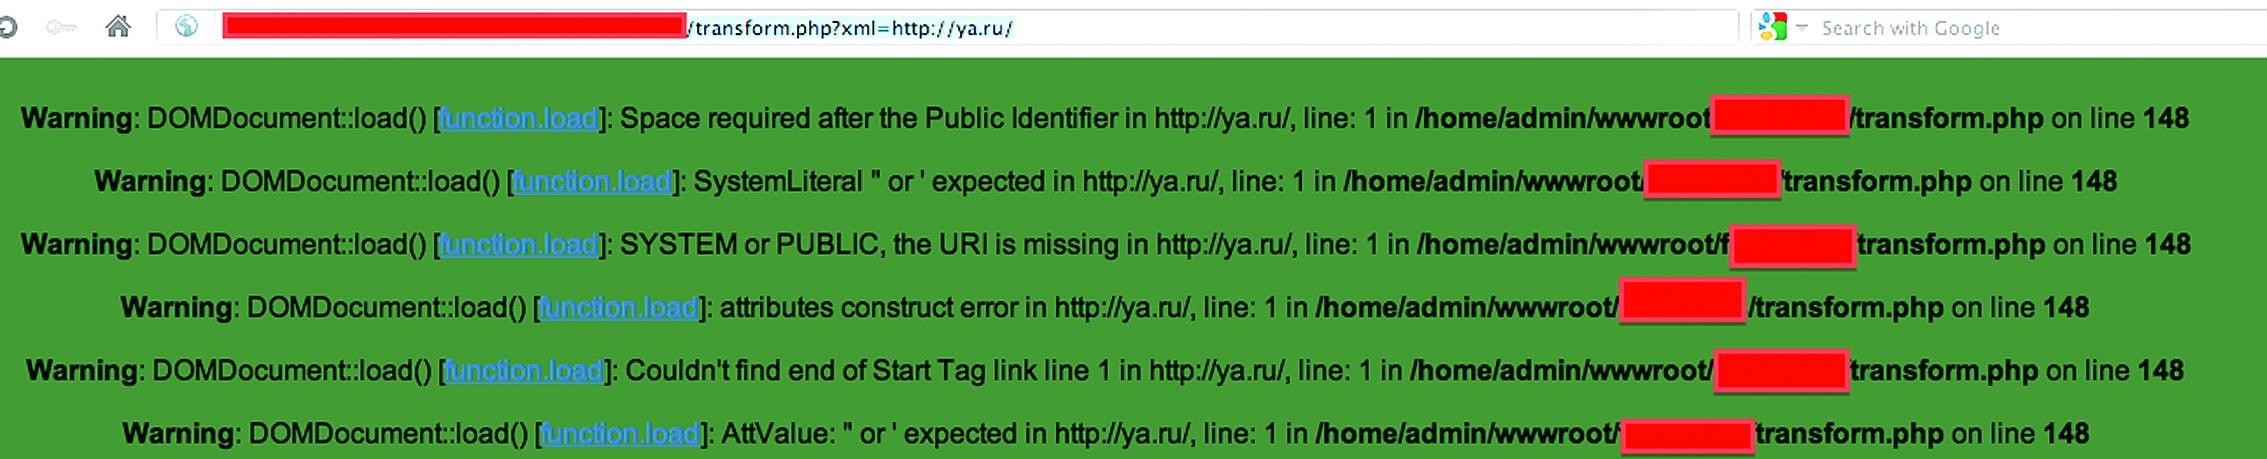 Тестим имя XML-документа